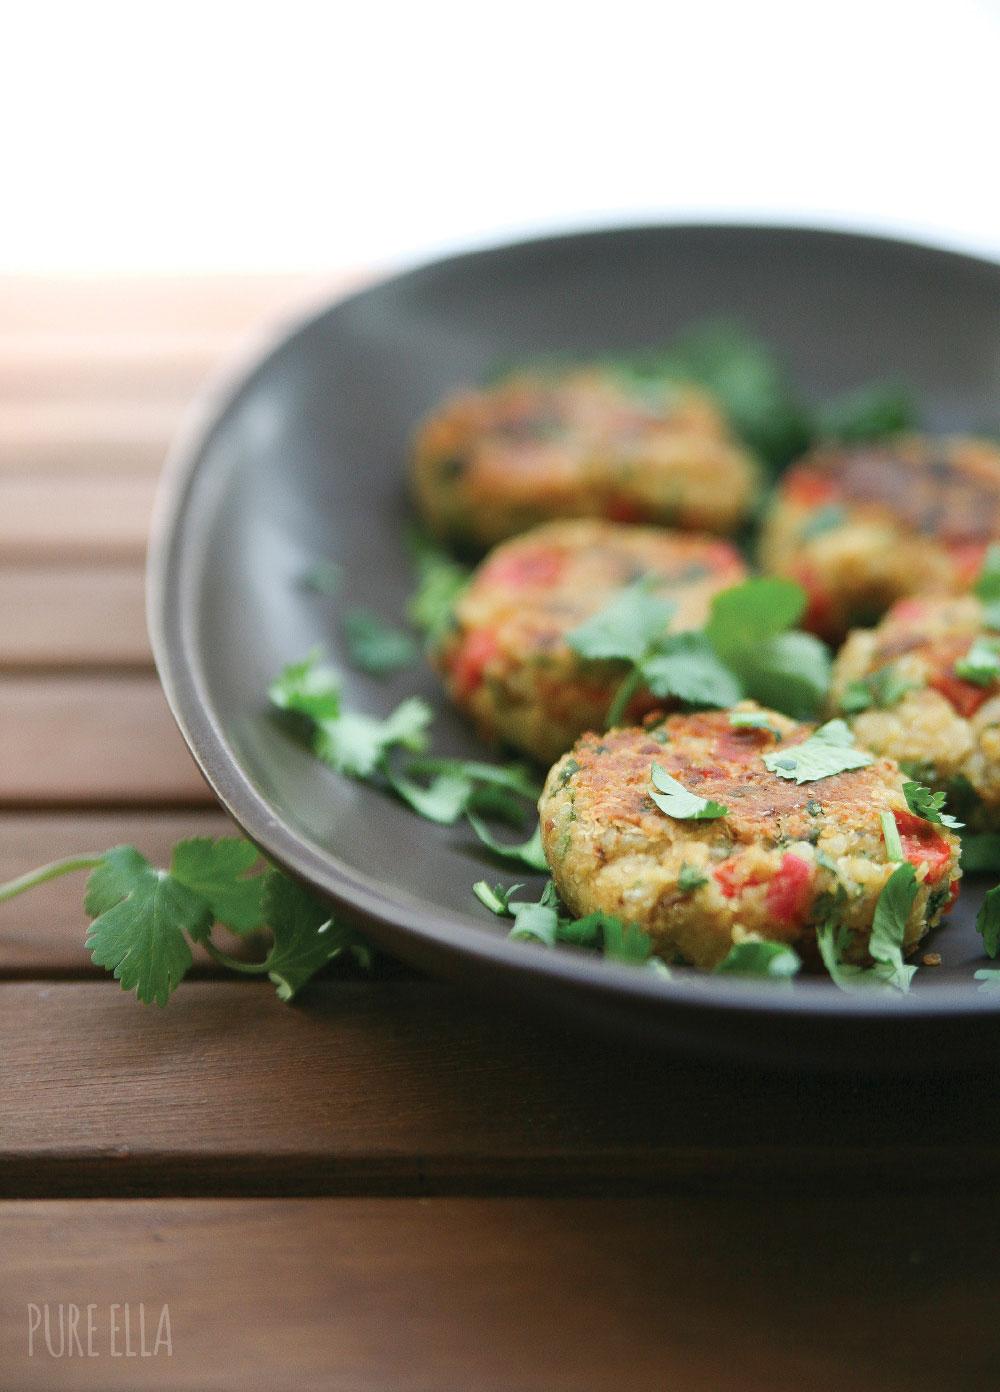 Pure-Ella-Quinoa-Chickpea-Burgers-vegan-gluten-free4